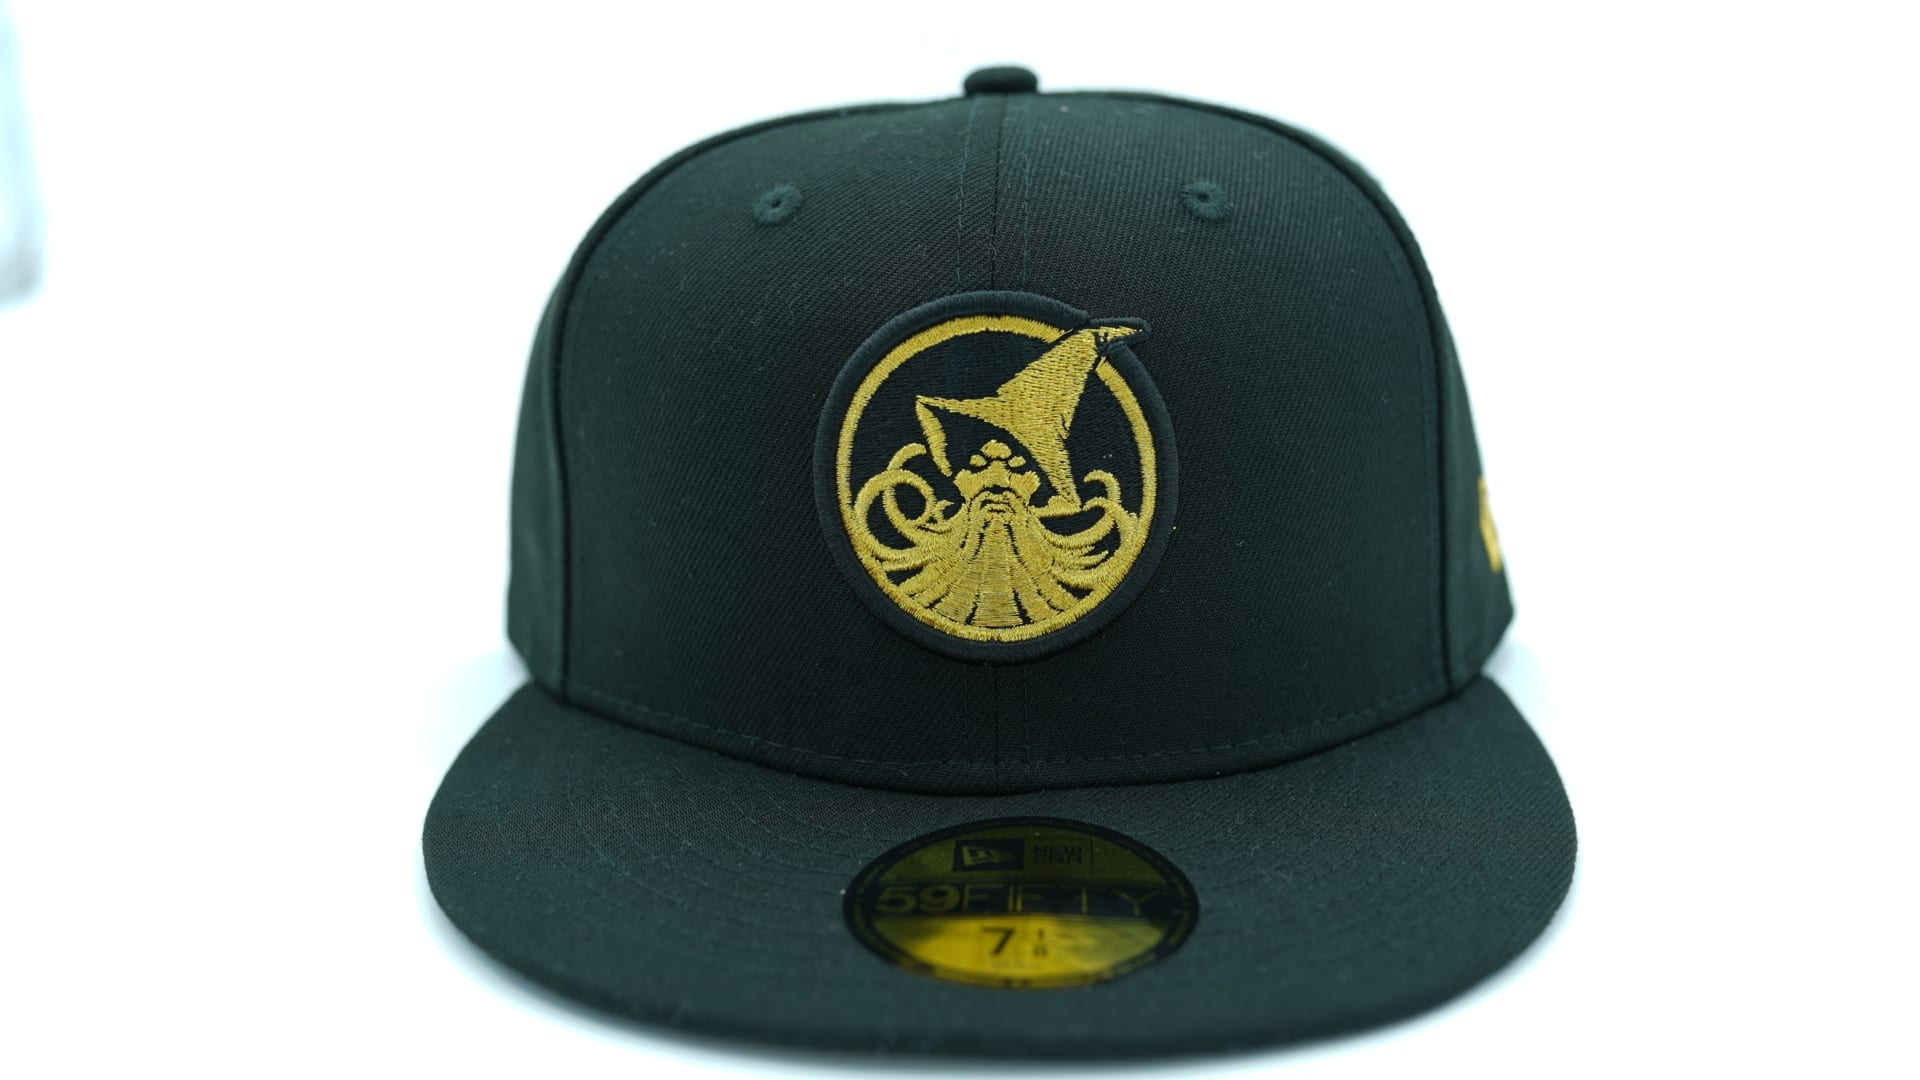 new era x ncaa lsu tigers 59fifty fitted baseball cap